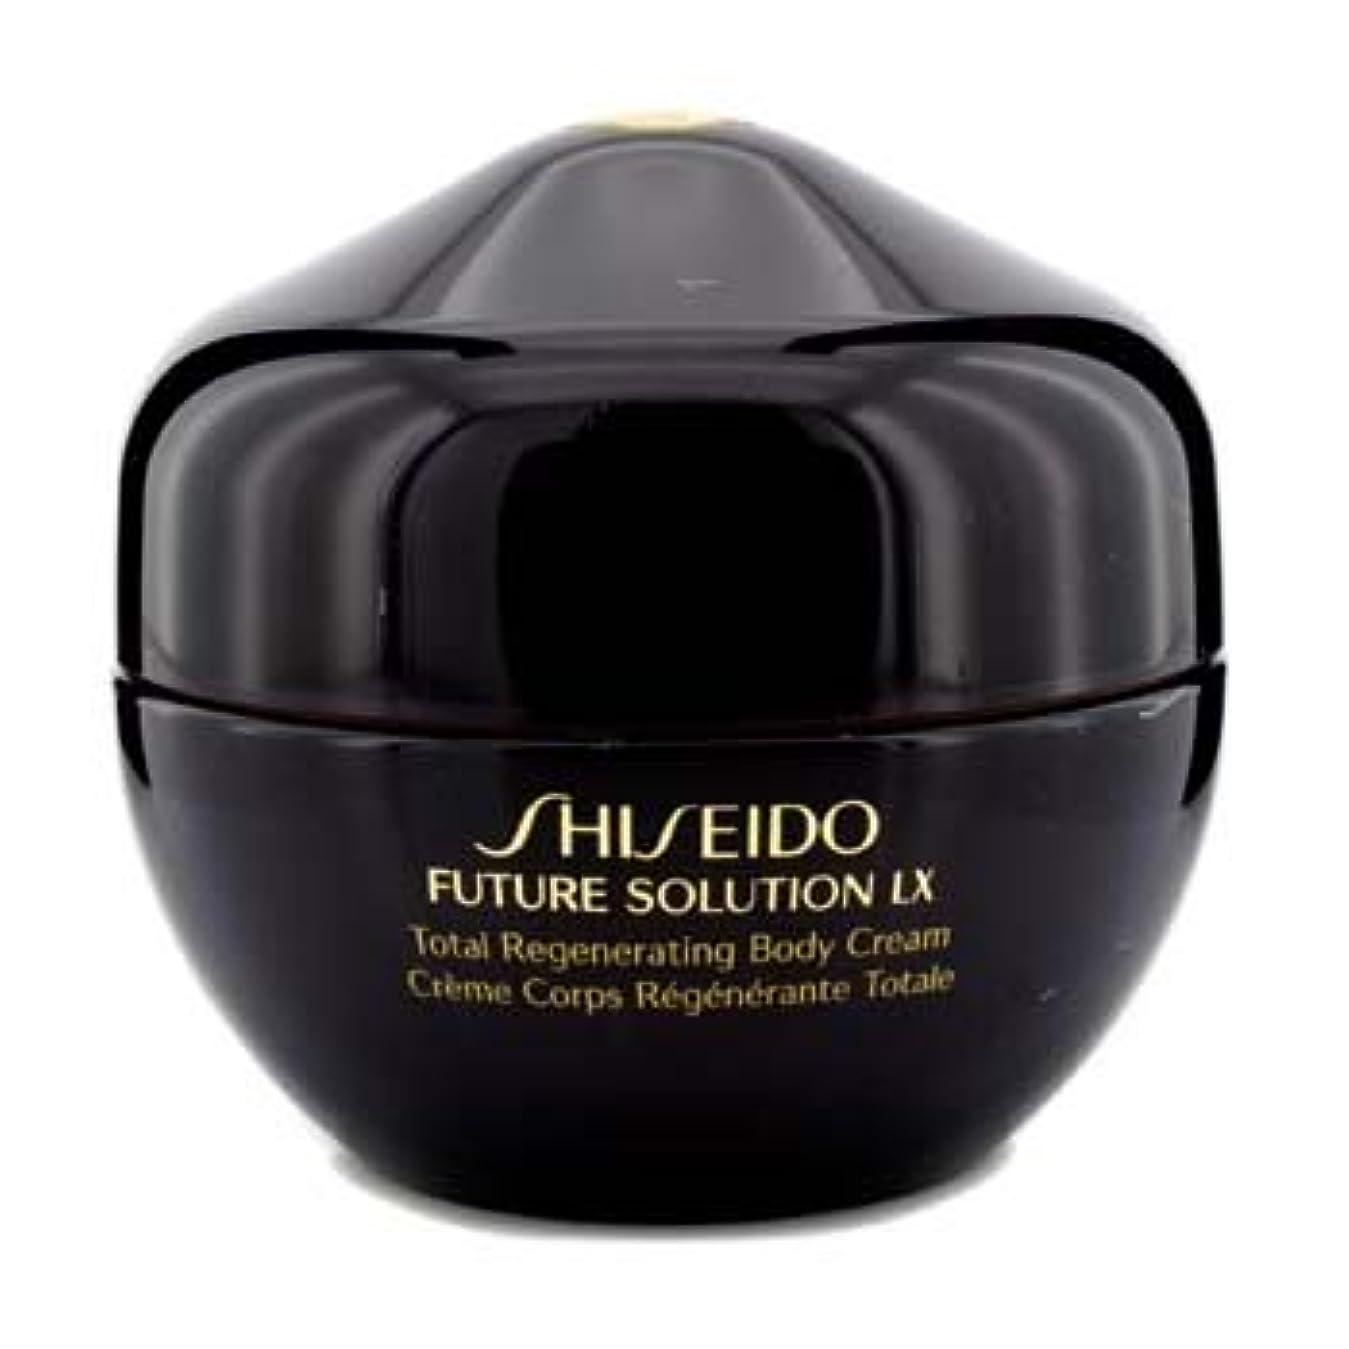 [Shiseido] Future Solution LX Total Regenerating Body Cream 200ml/6.7oz